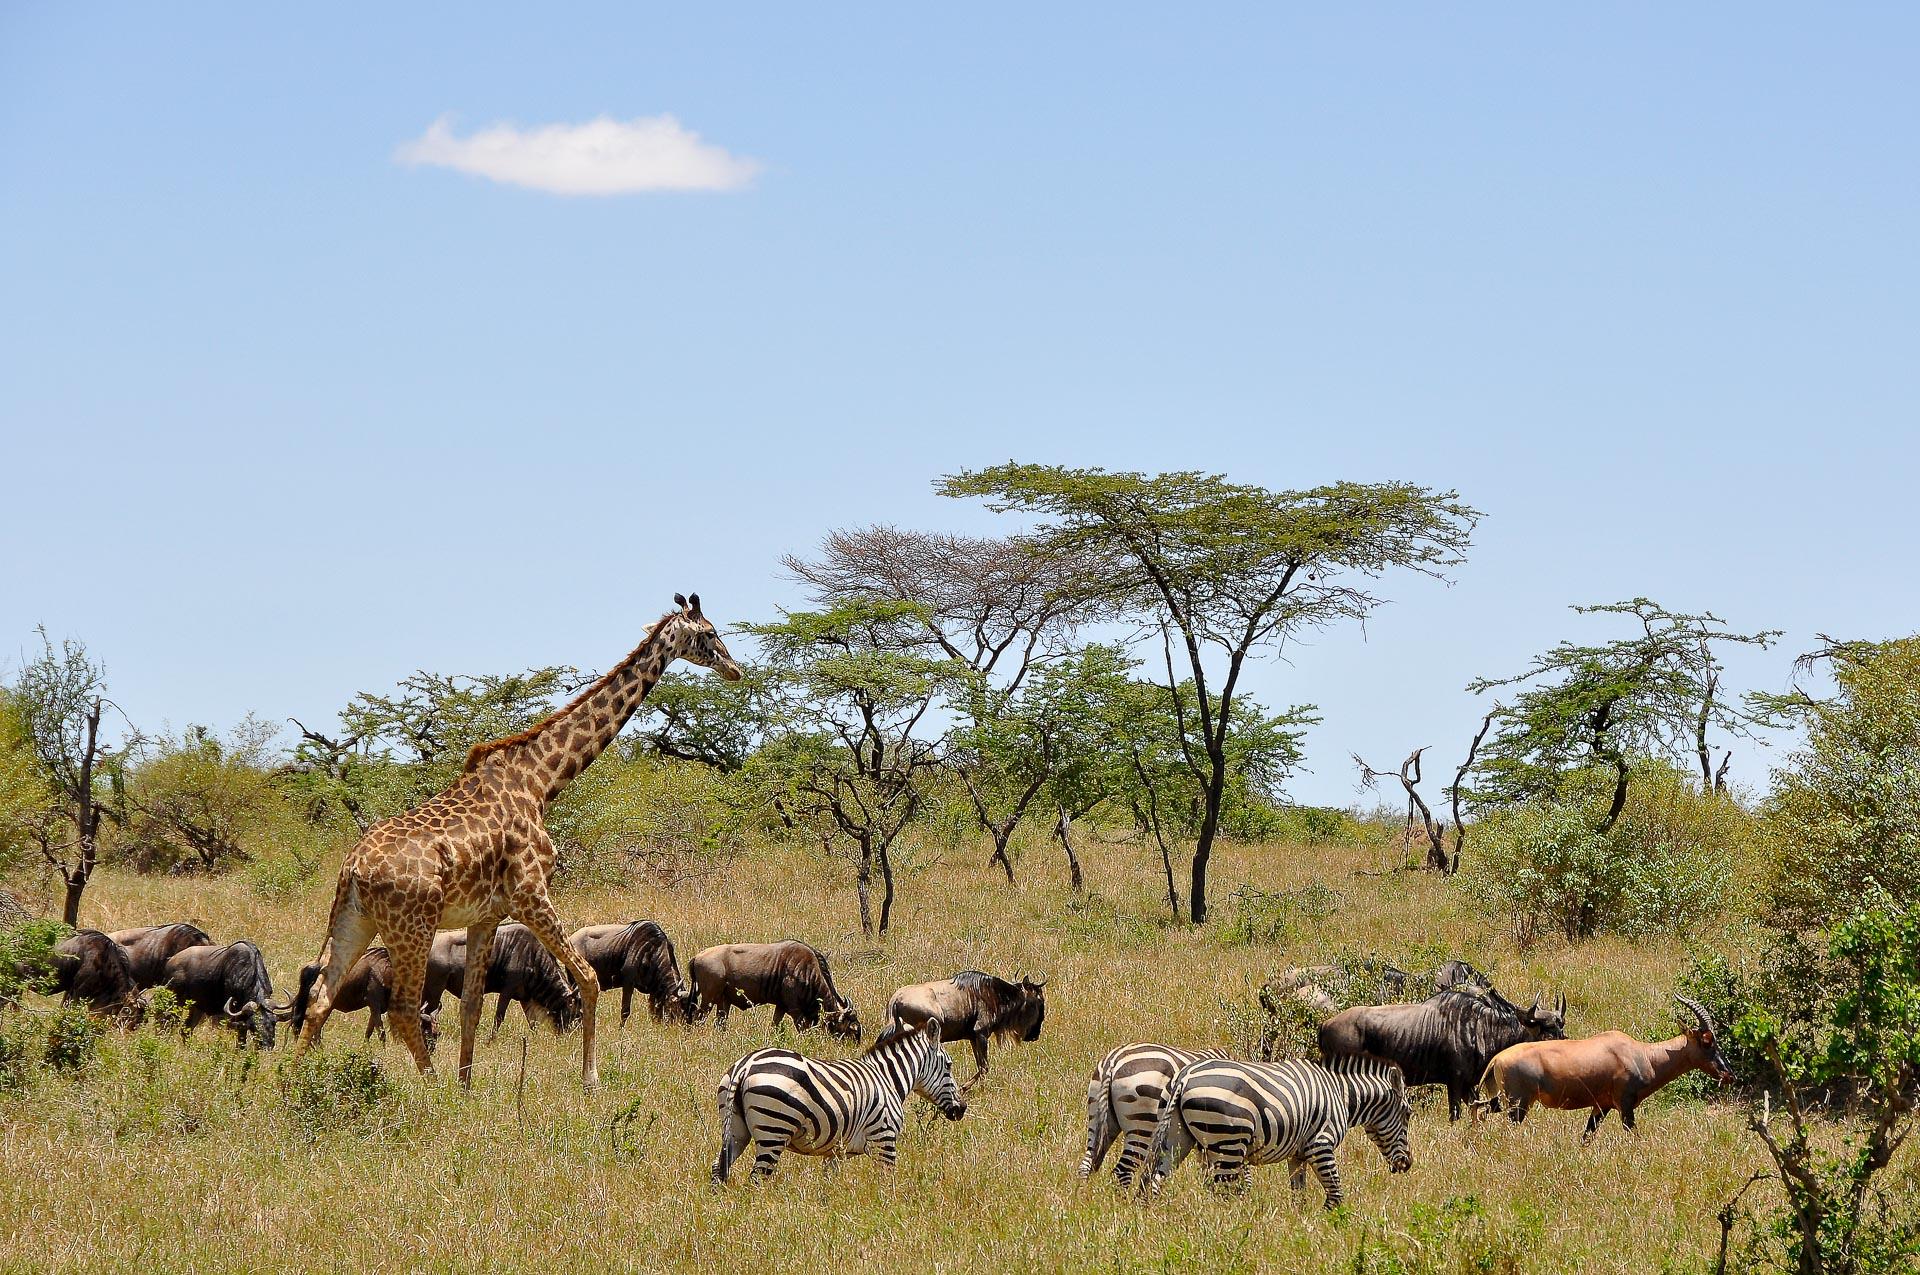 Masai-Mara-Kenia-Globetrotter-Select-13